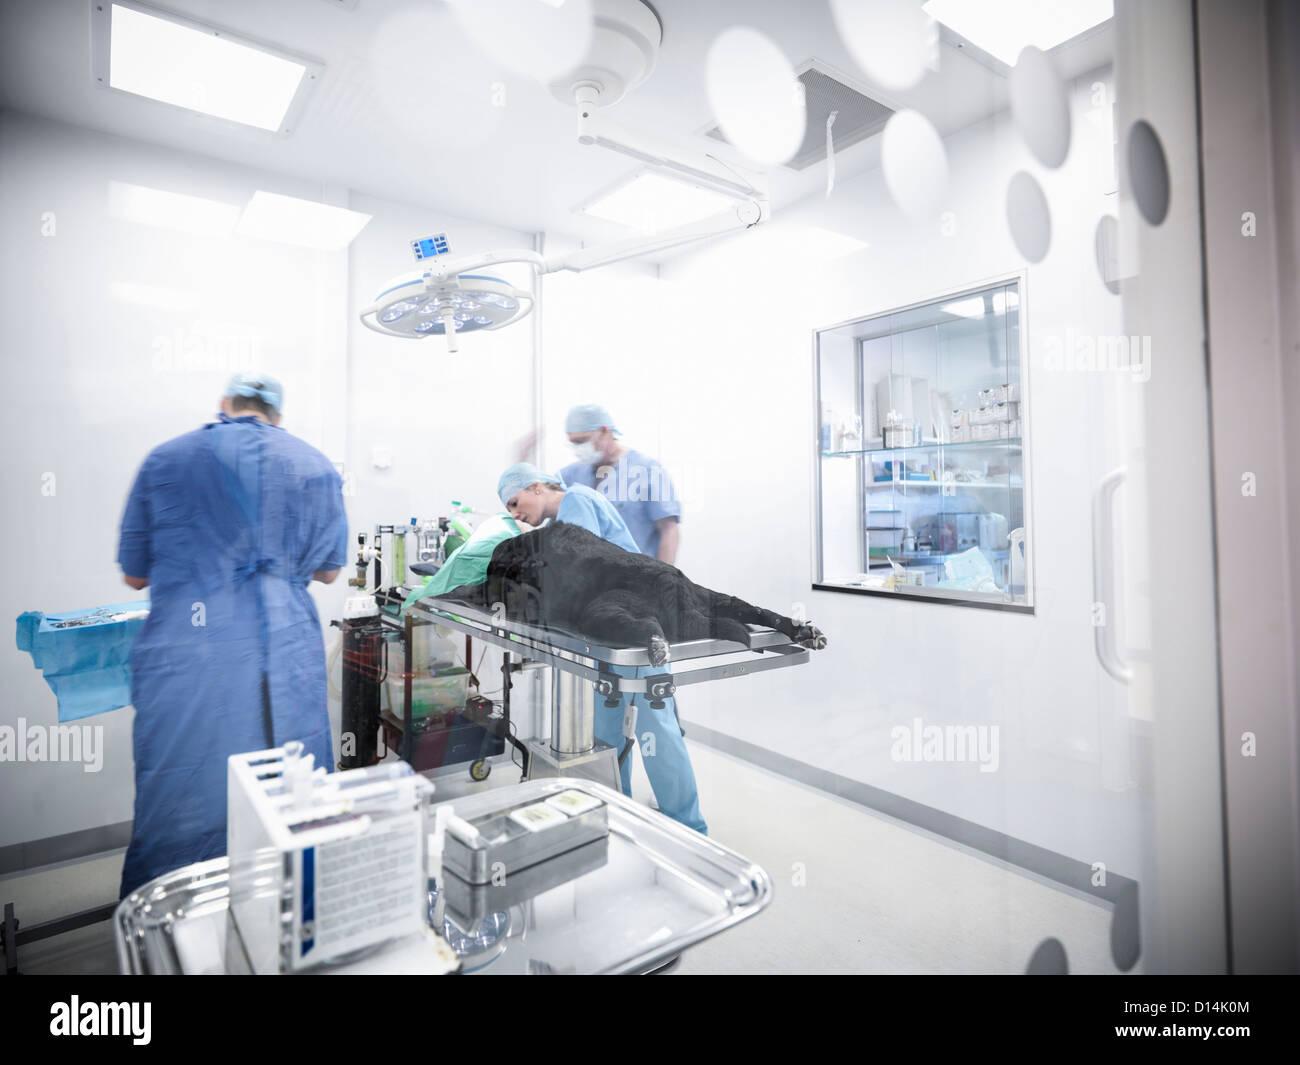 Veterinarians operating on dog - Stock Image